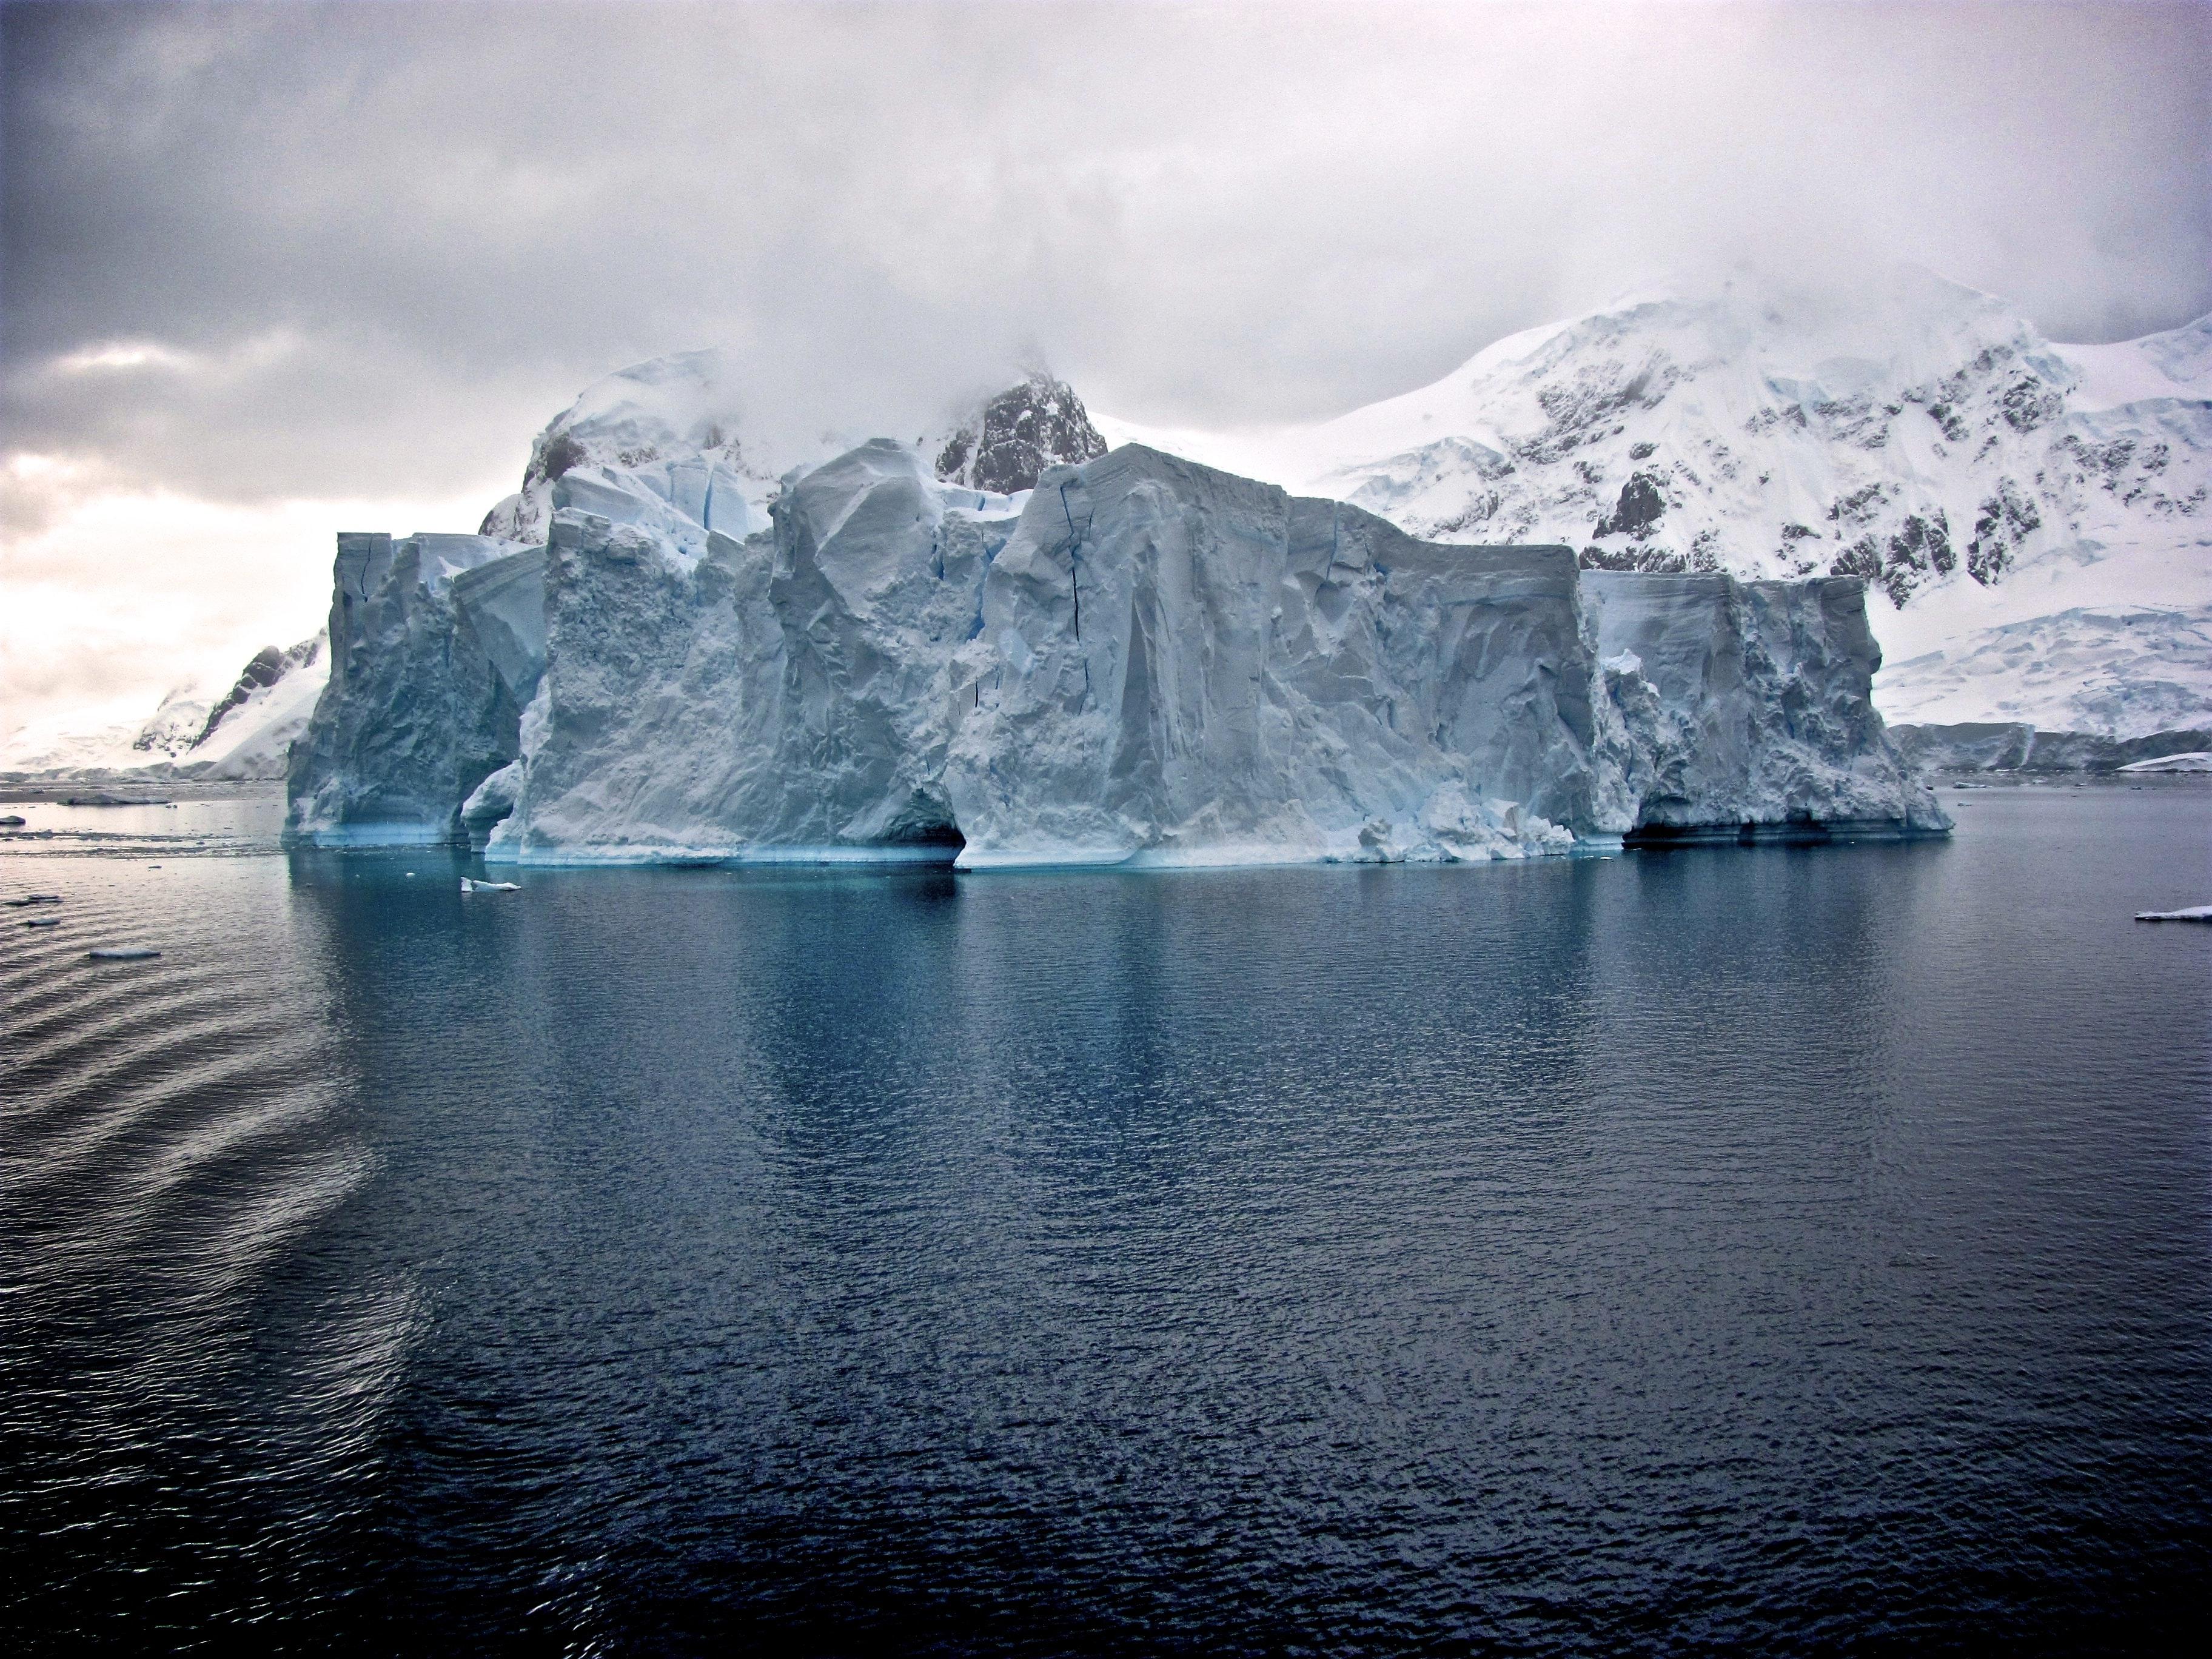 arctic-iceberg-water-cold